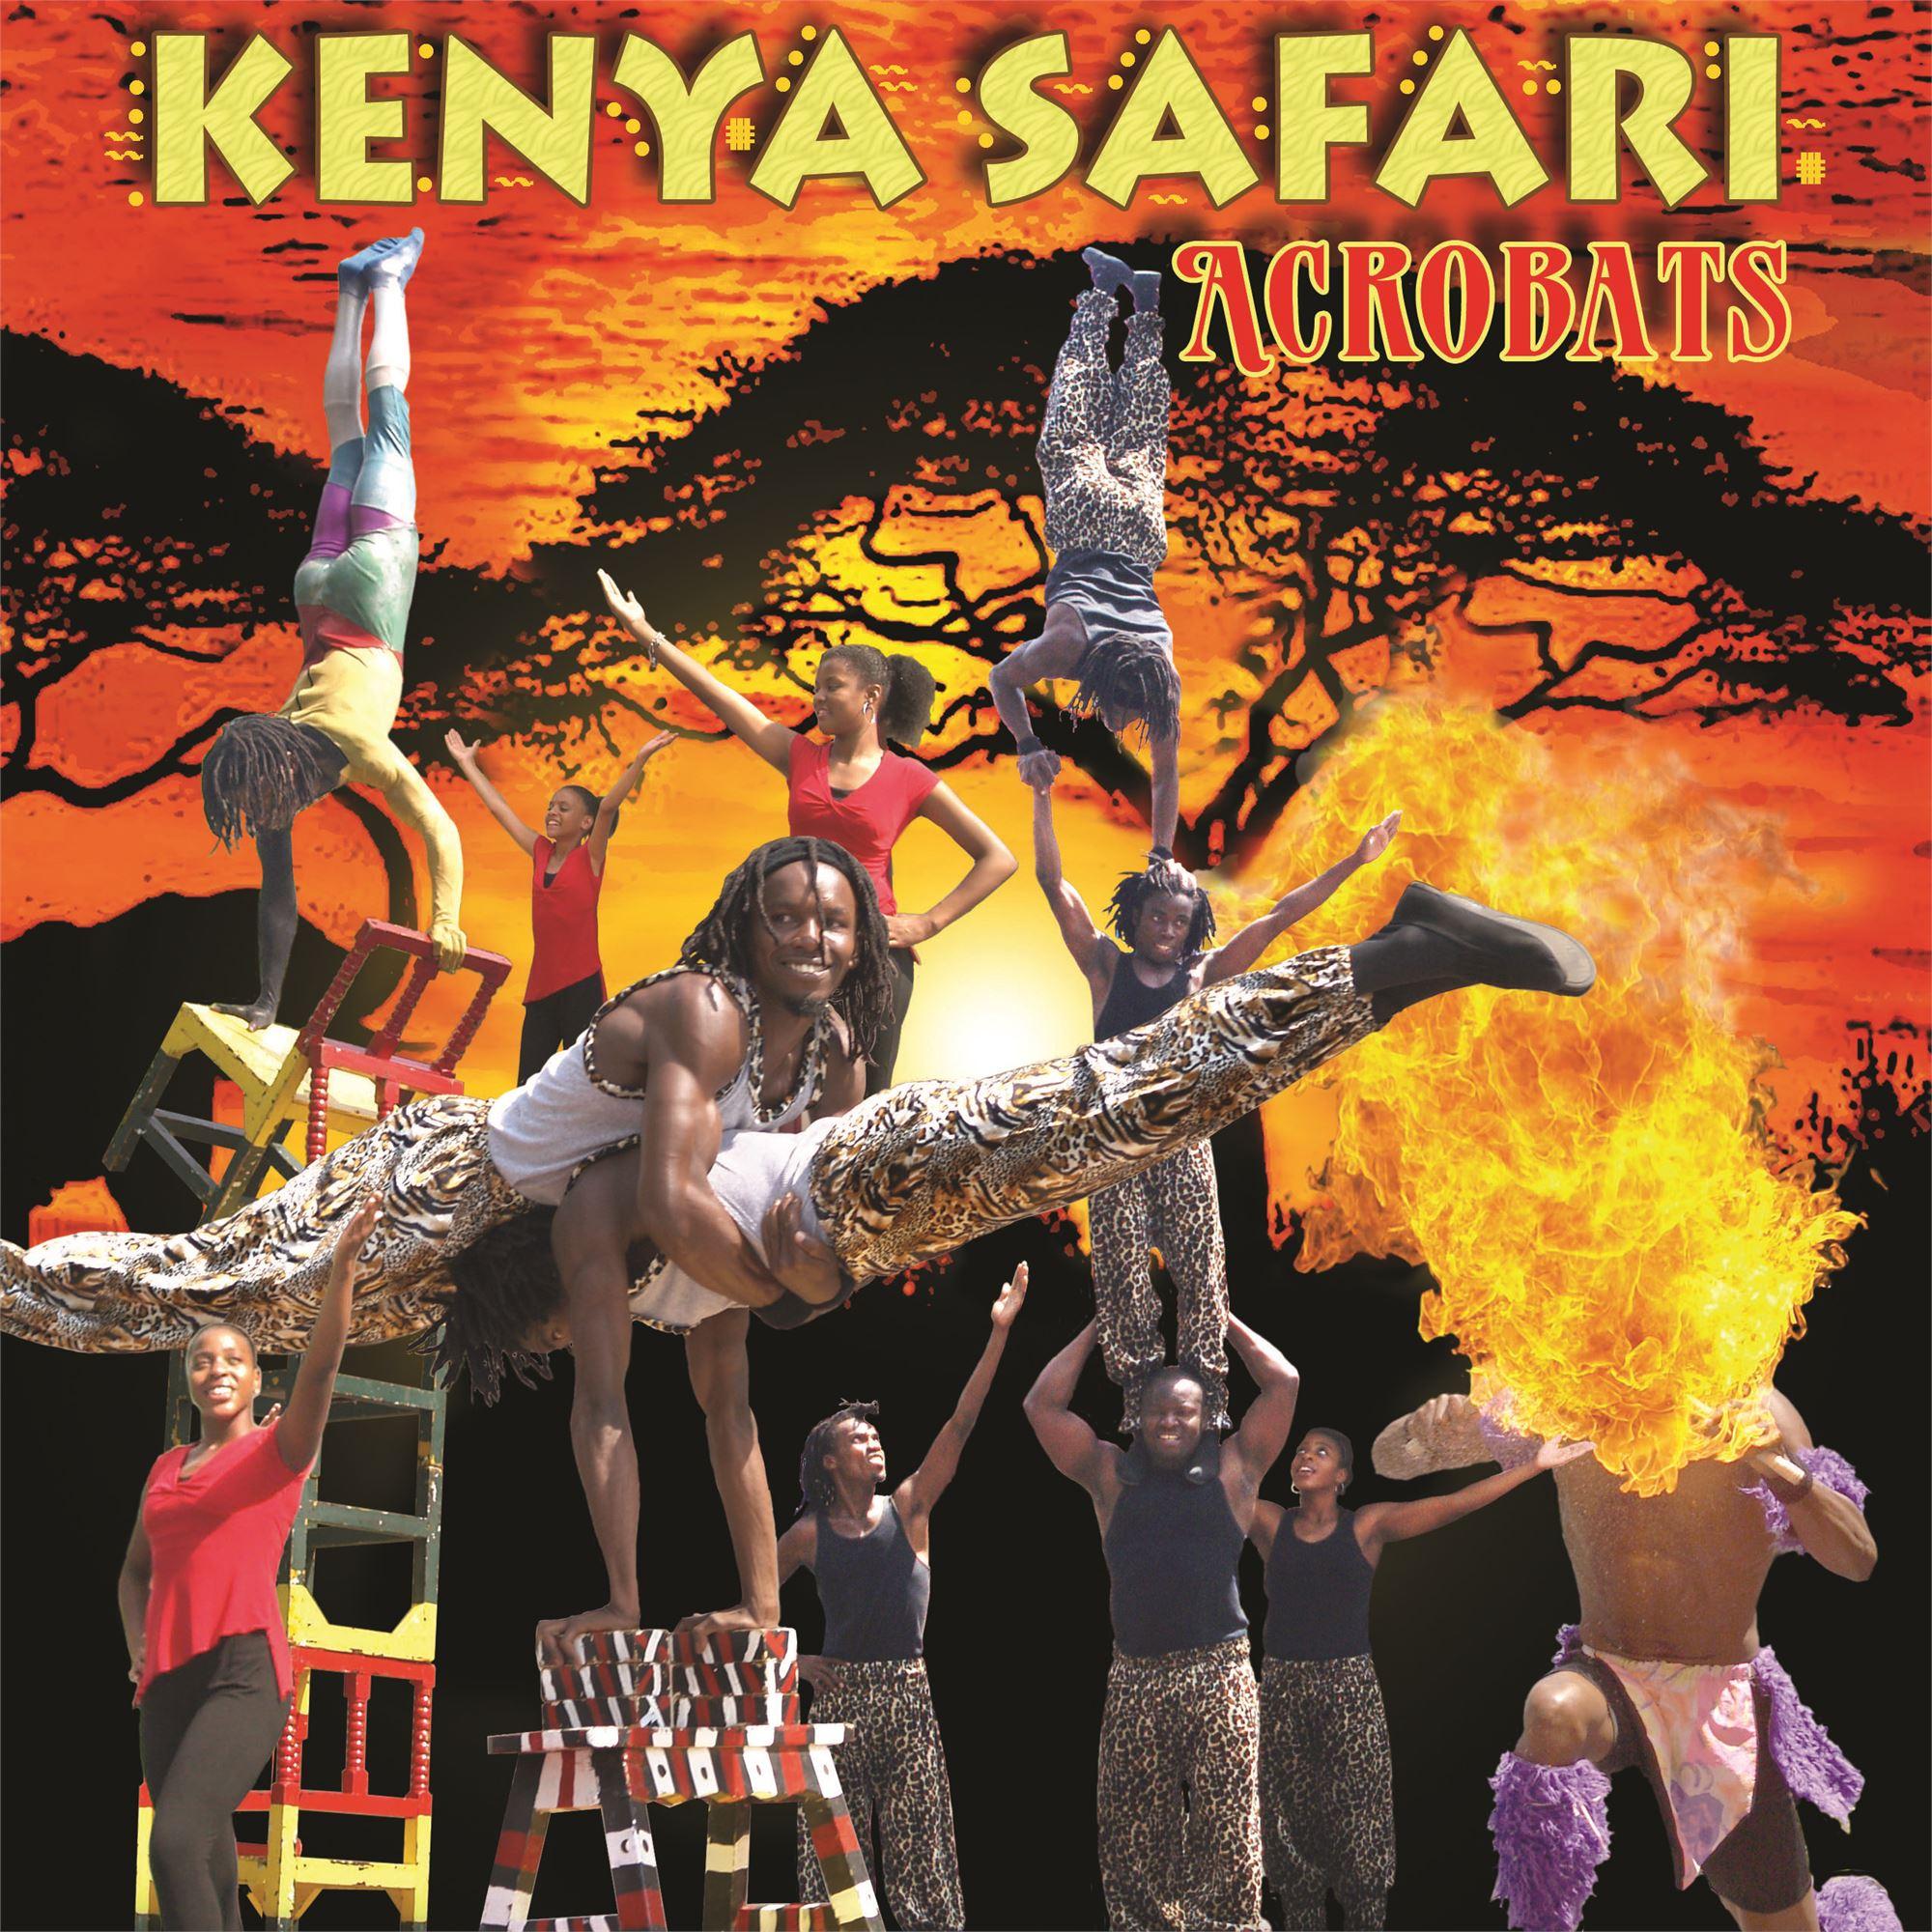 Kenya Safari Acrobats